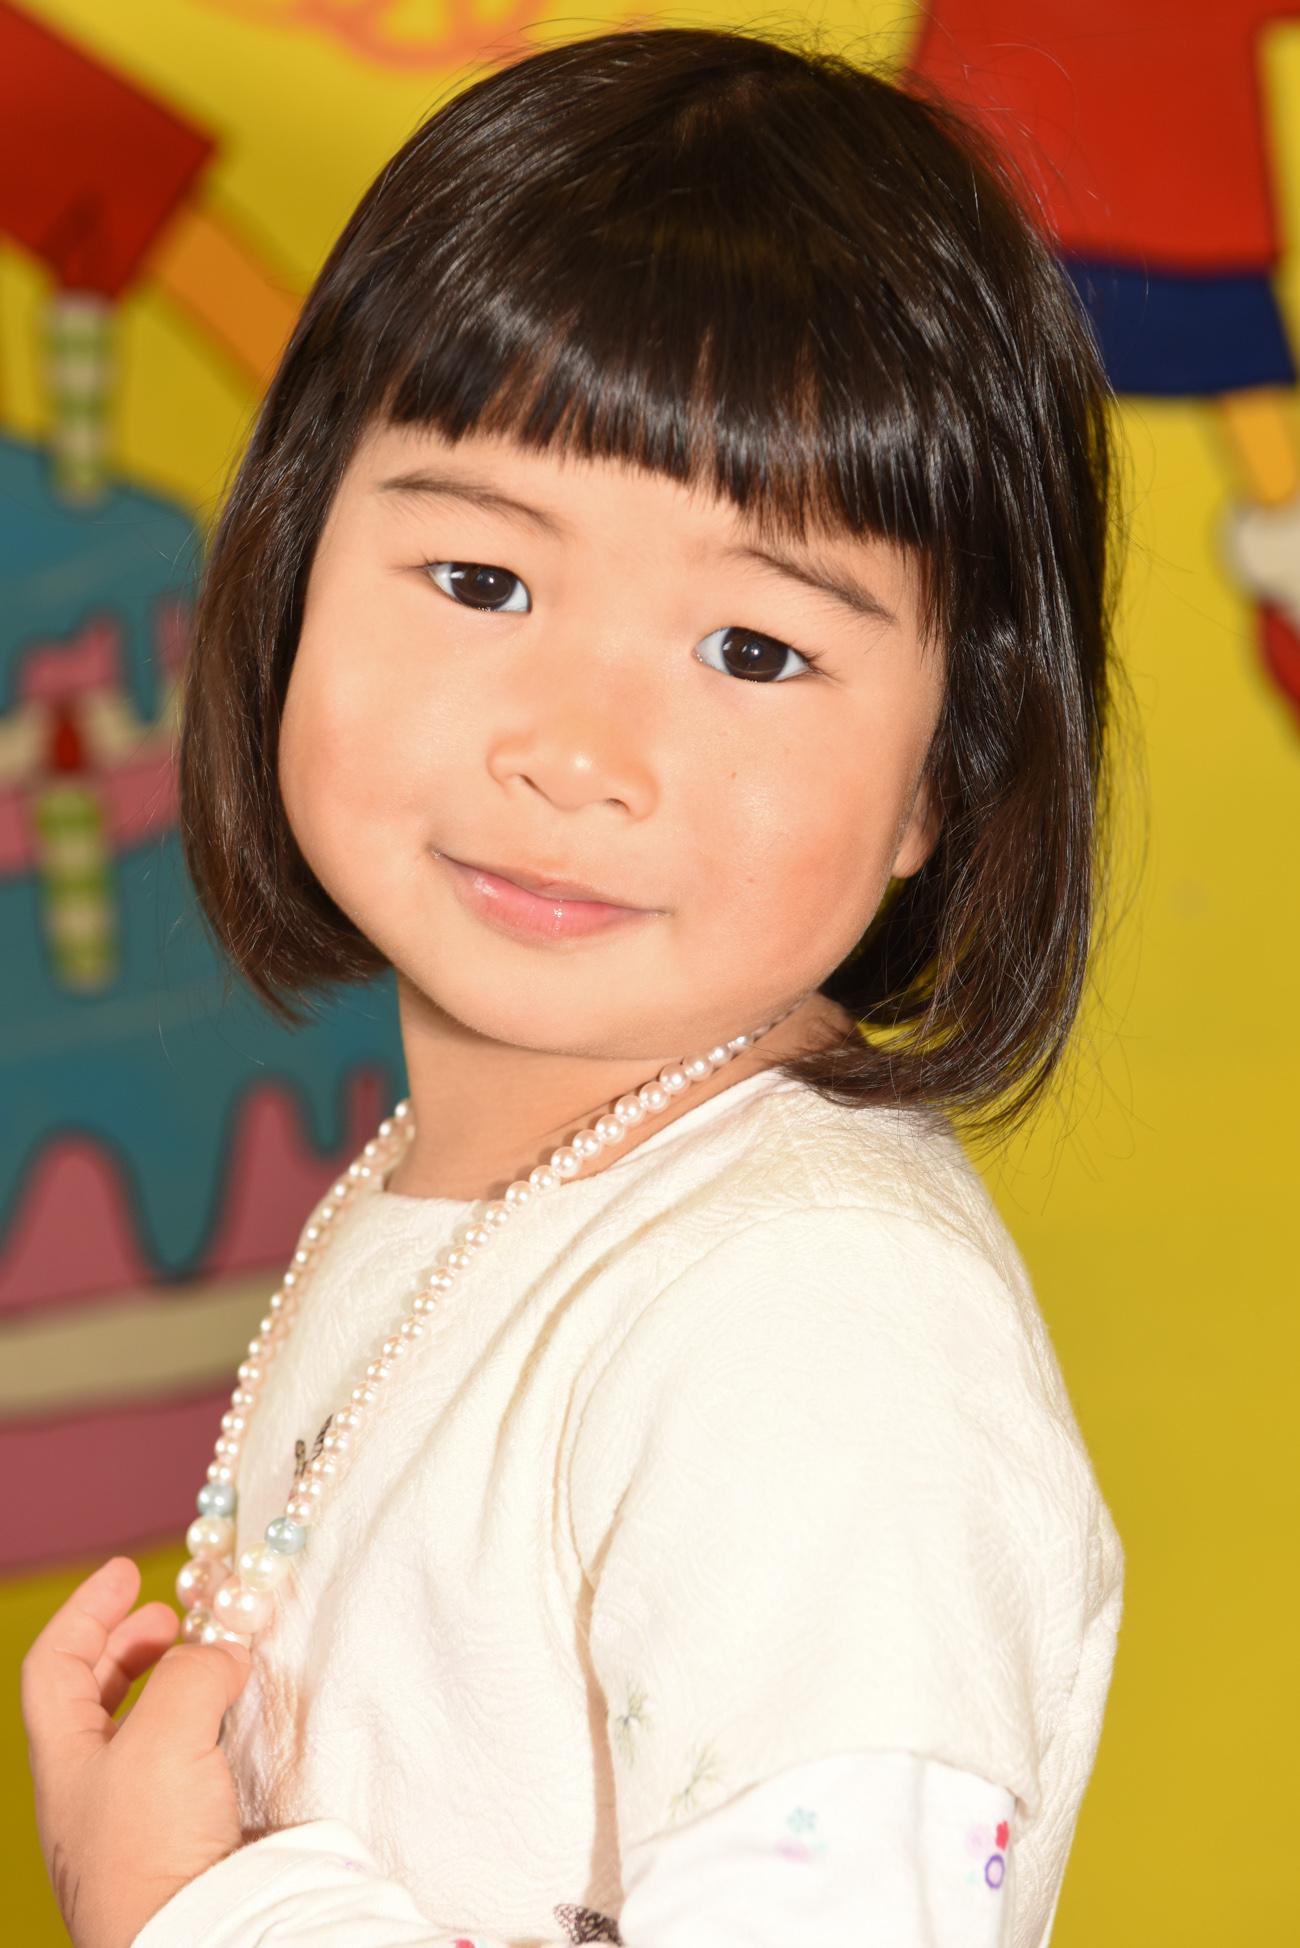 Little chinese child portrait